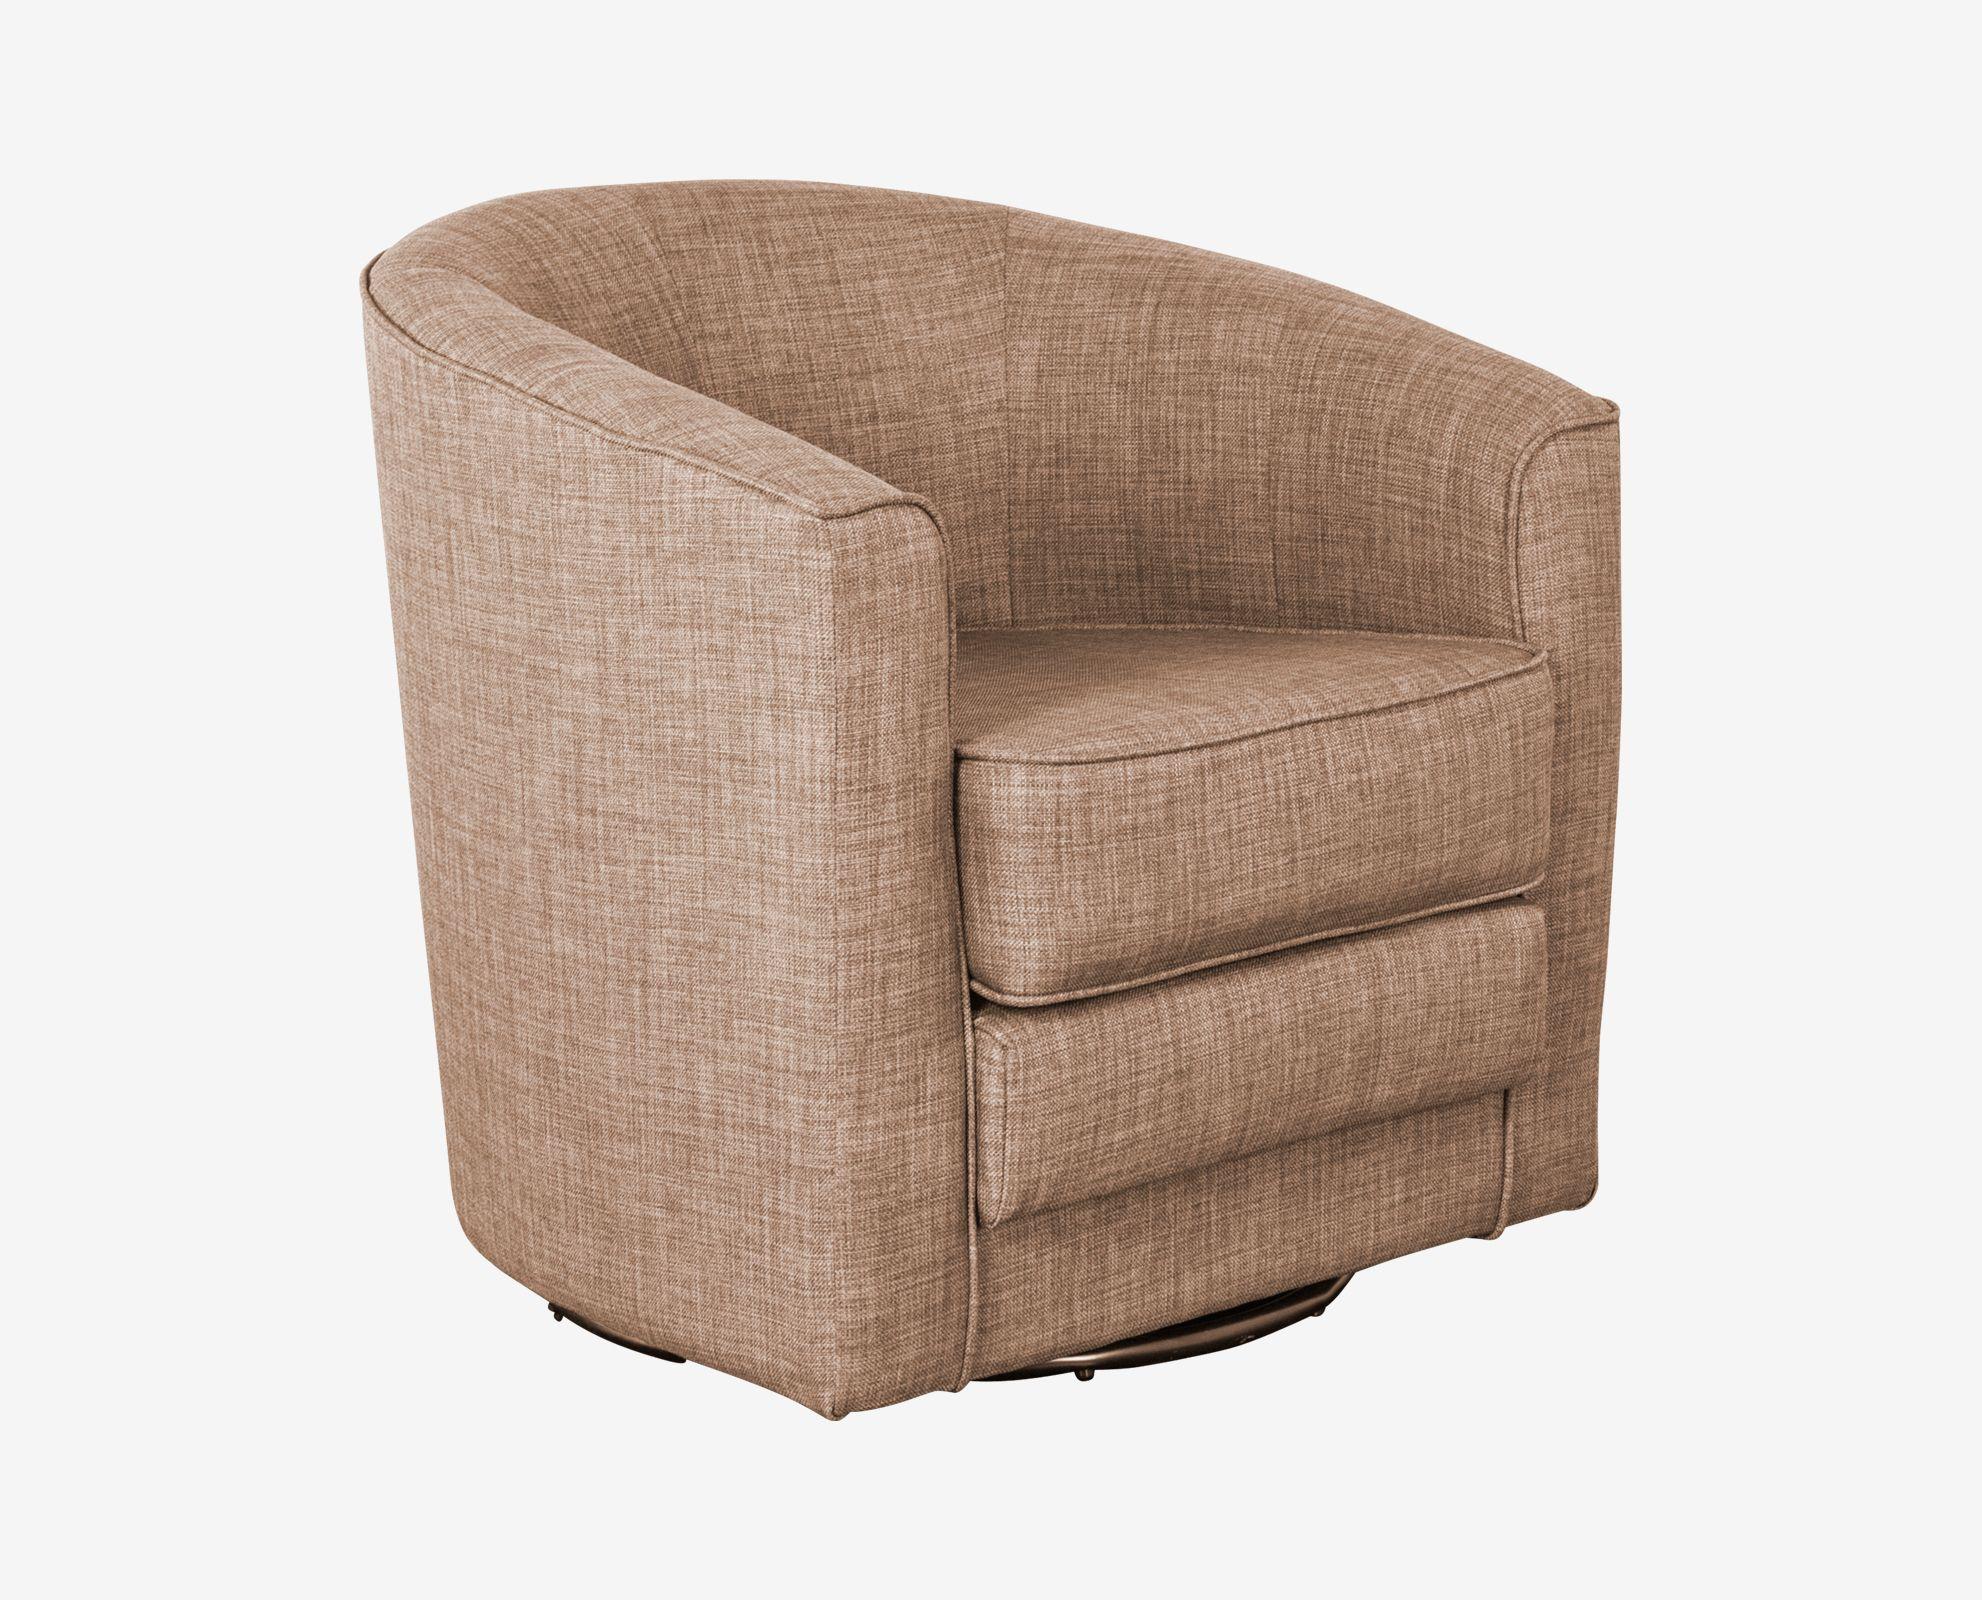 Magnificent Theva Swivel Chair Scandinavian Design 349 Swivel Chairs Ibusinesslaw Wood Chair Design Ideas Ibusinesslaworg